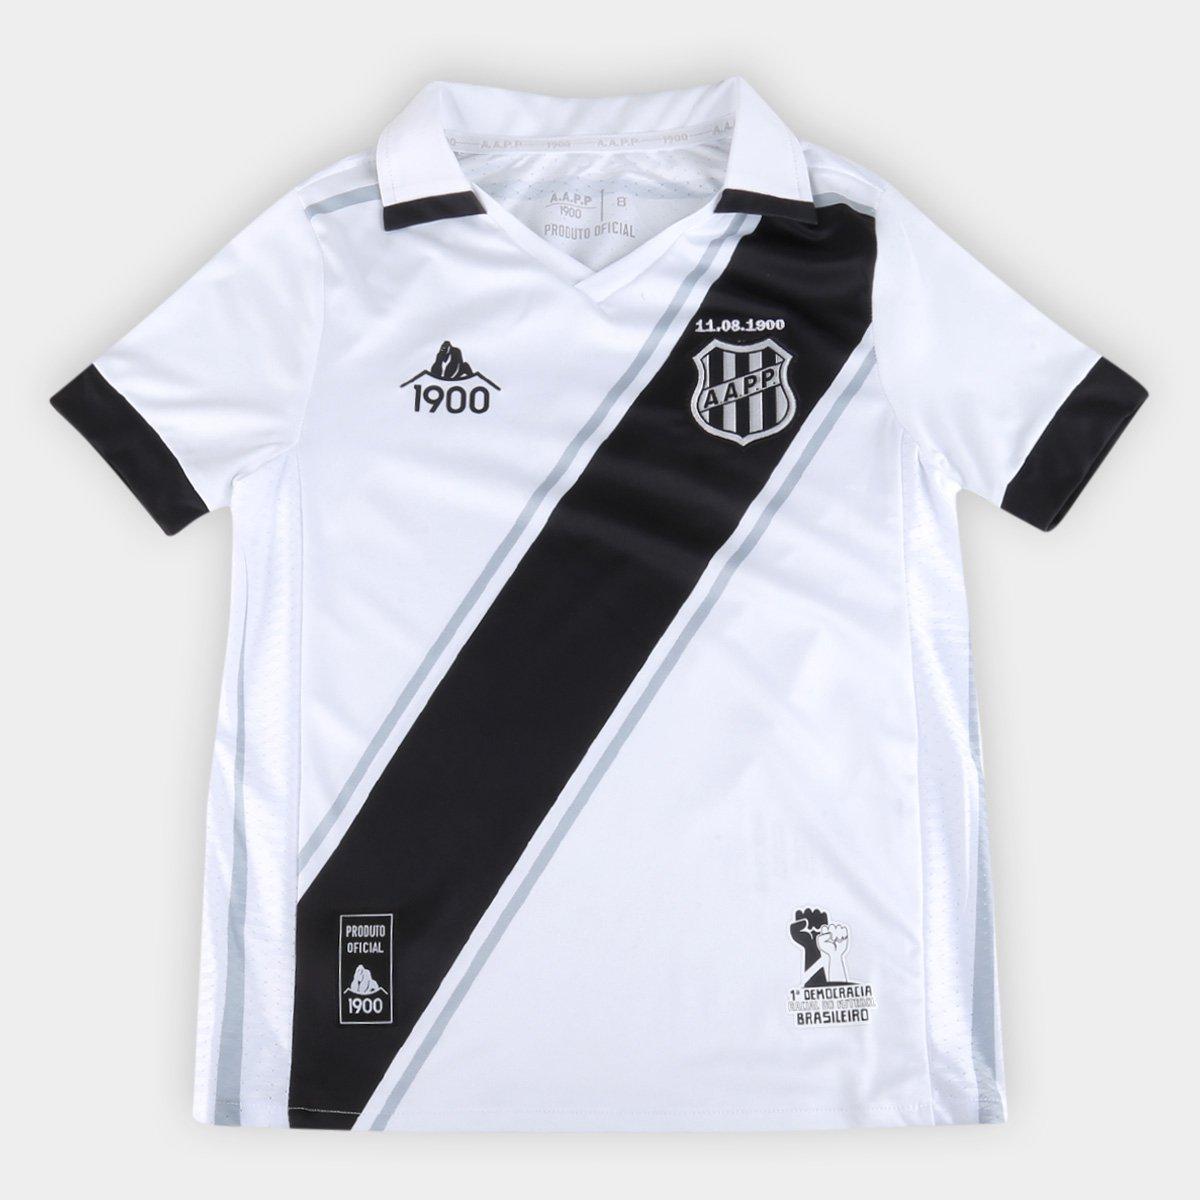 Camisa Ponte Preta Juvenil I 20/21 s/n° Torcedor 1900